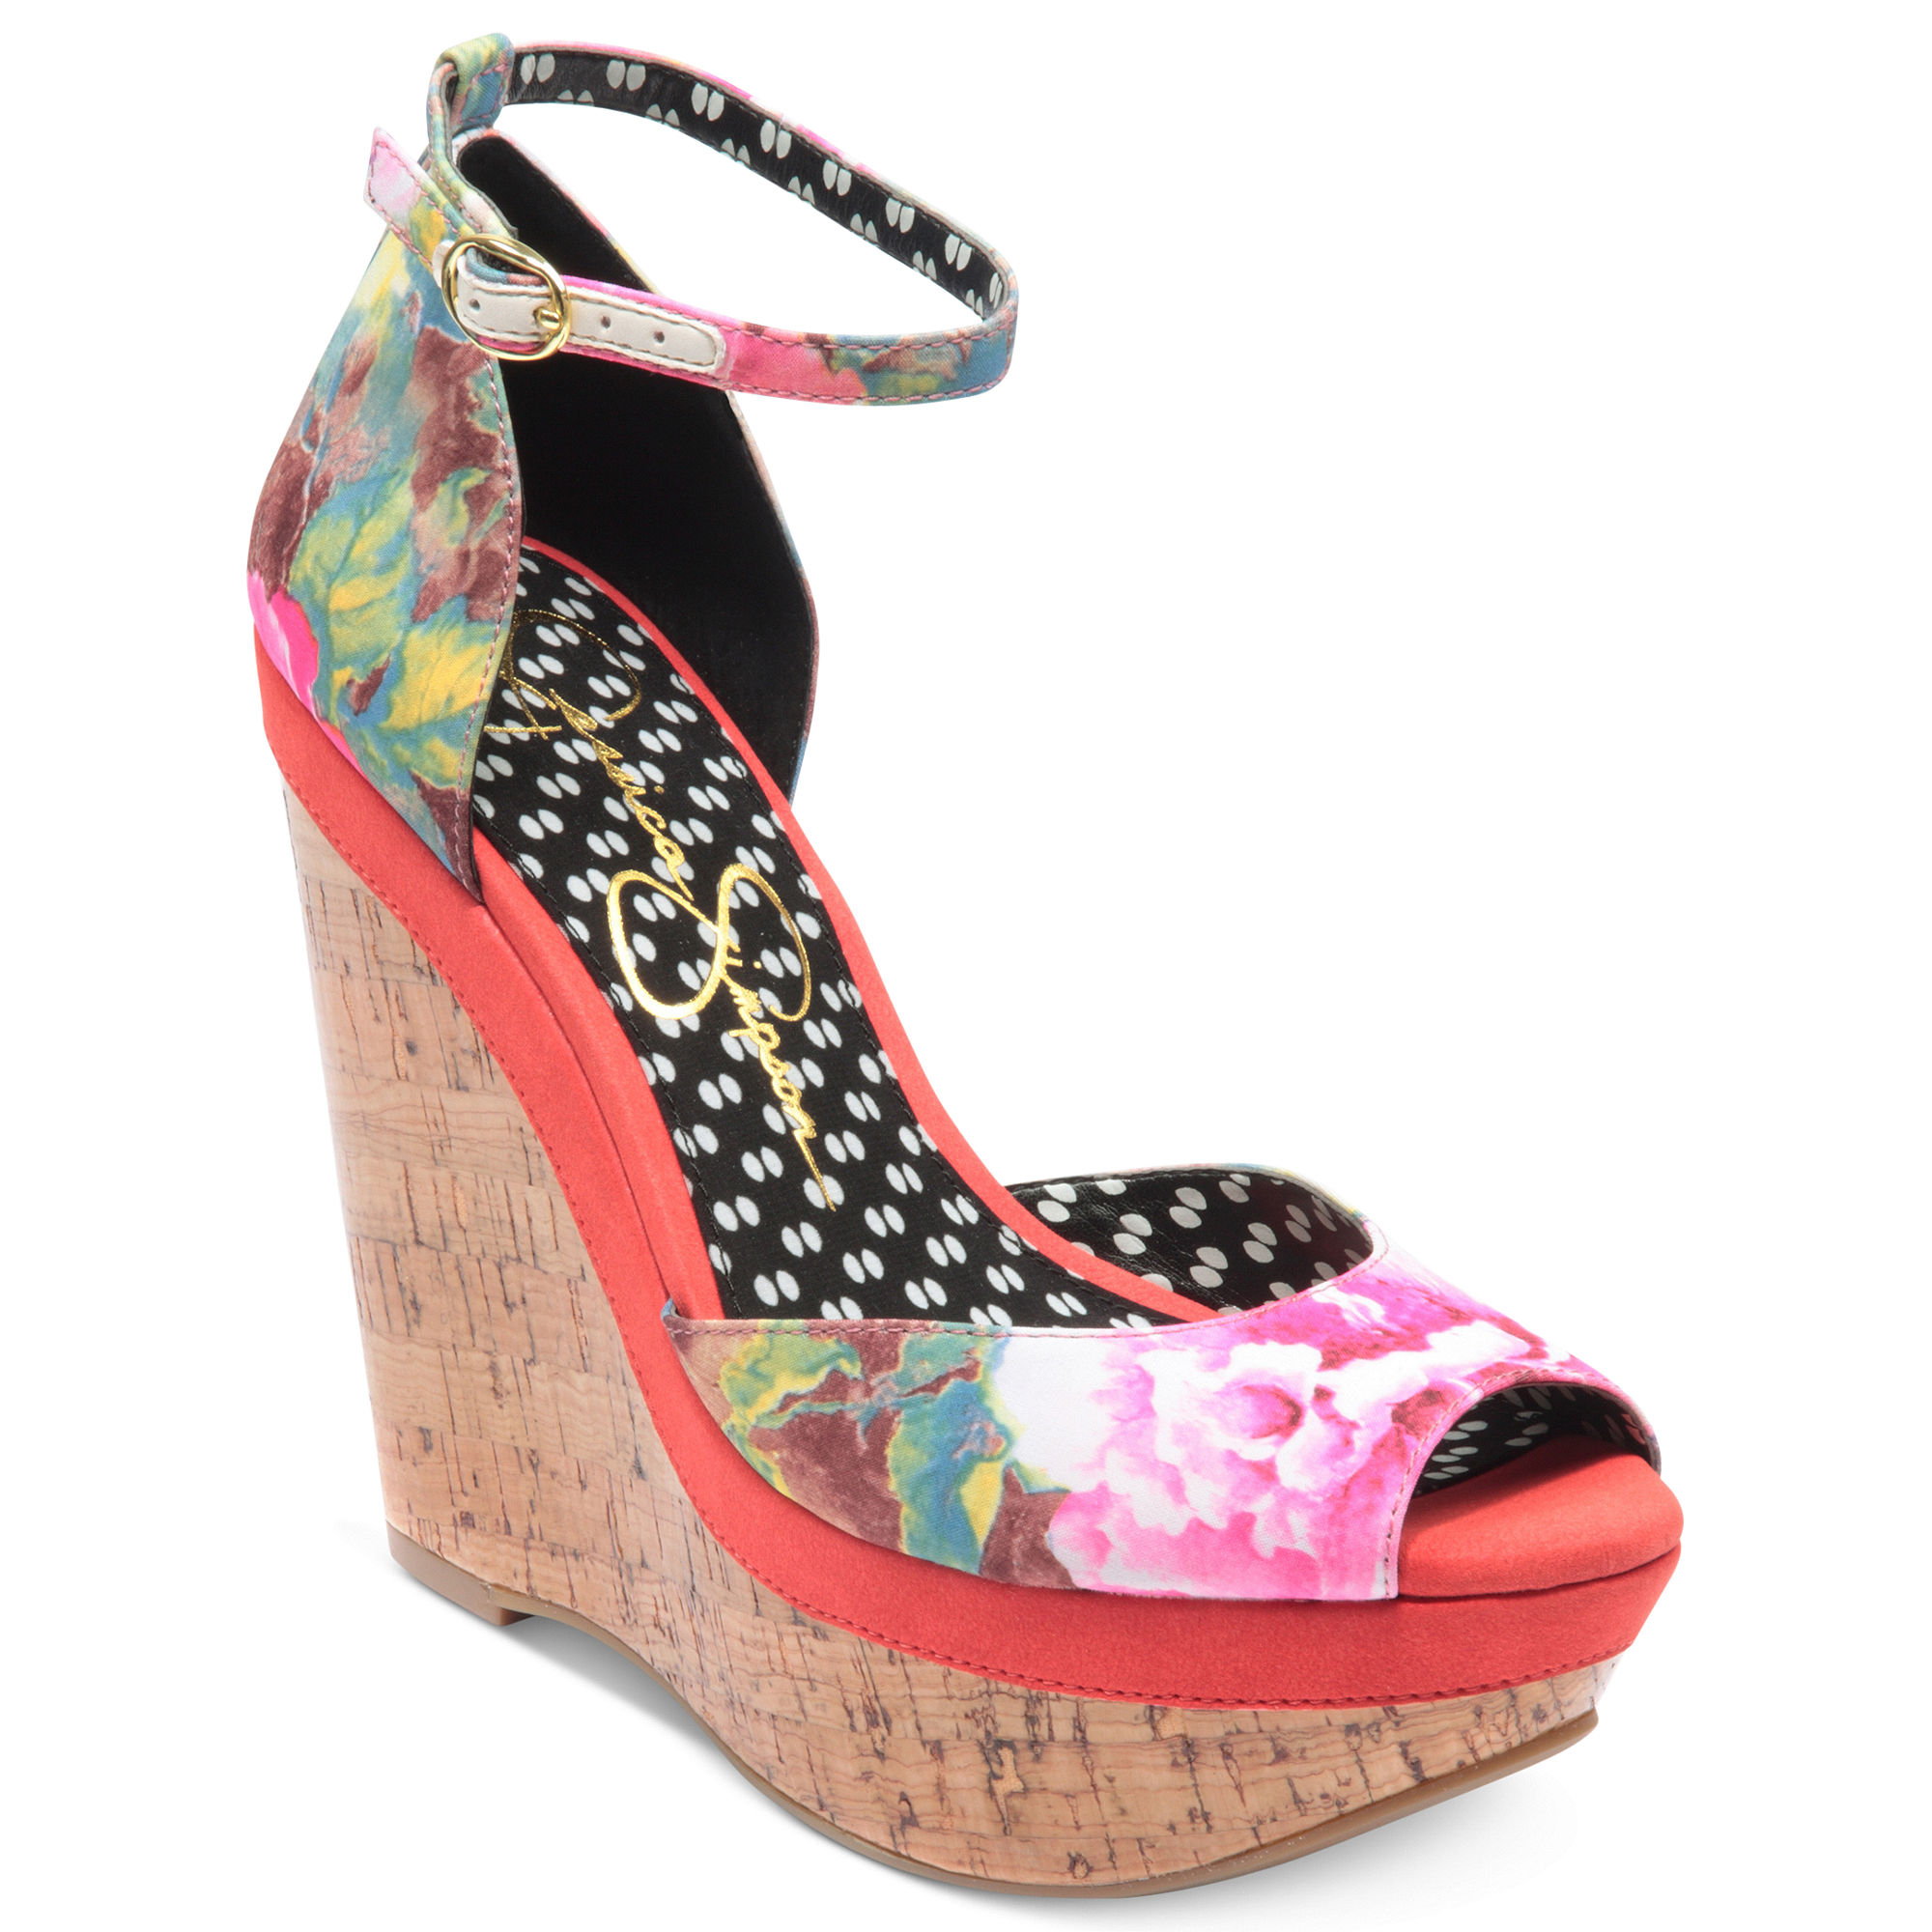 17a4cfcb7f8 Lyst - Jessica Simpson Keira Platform Wedge Sandals